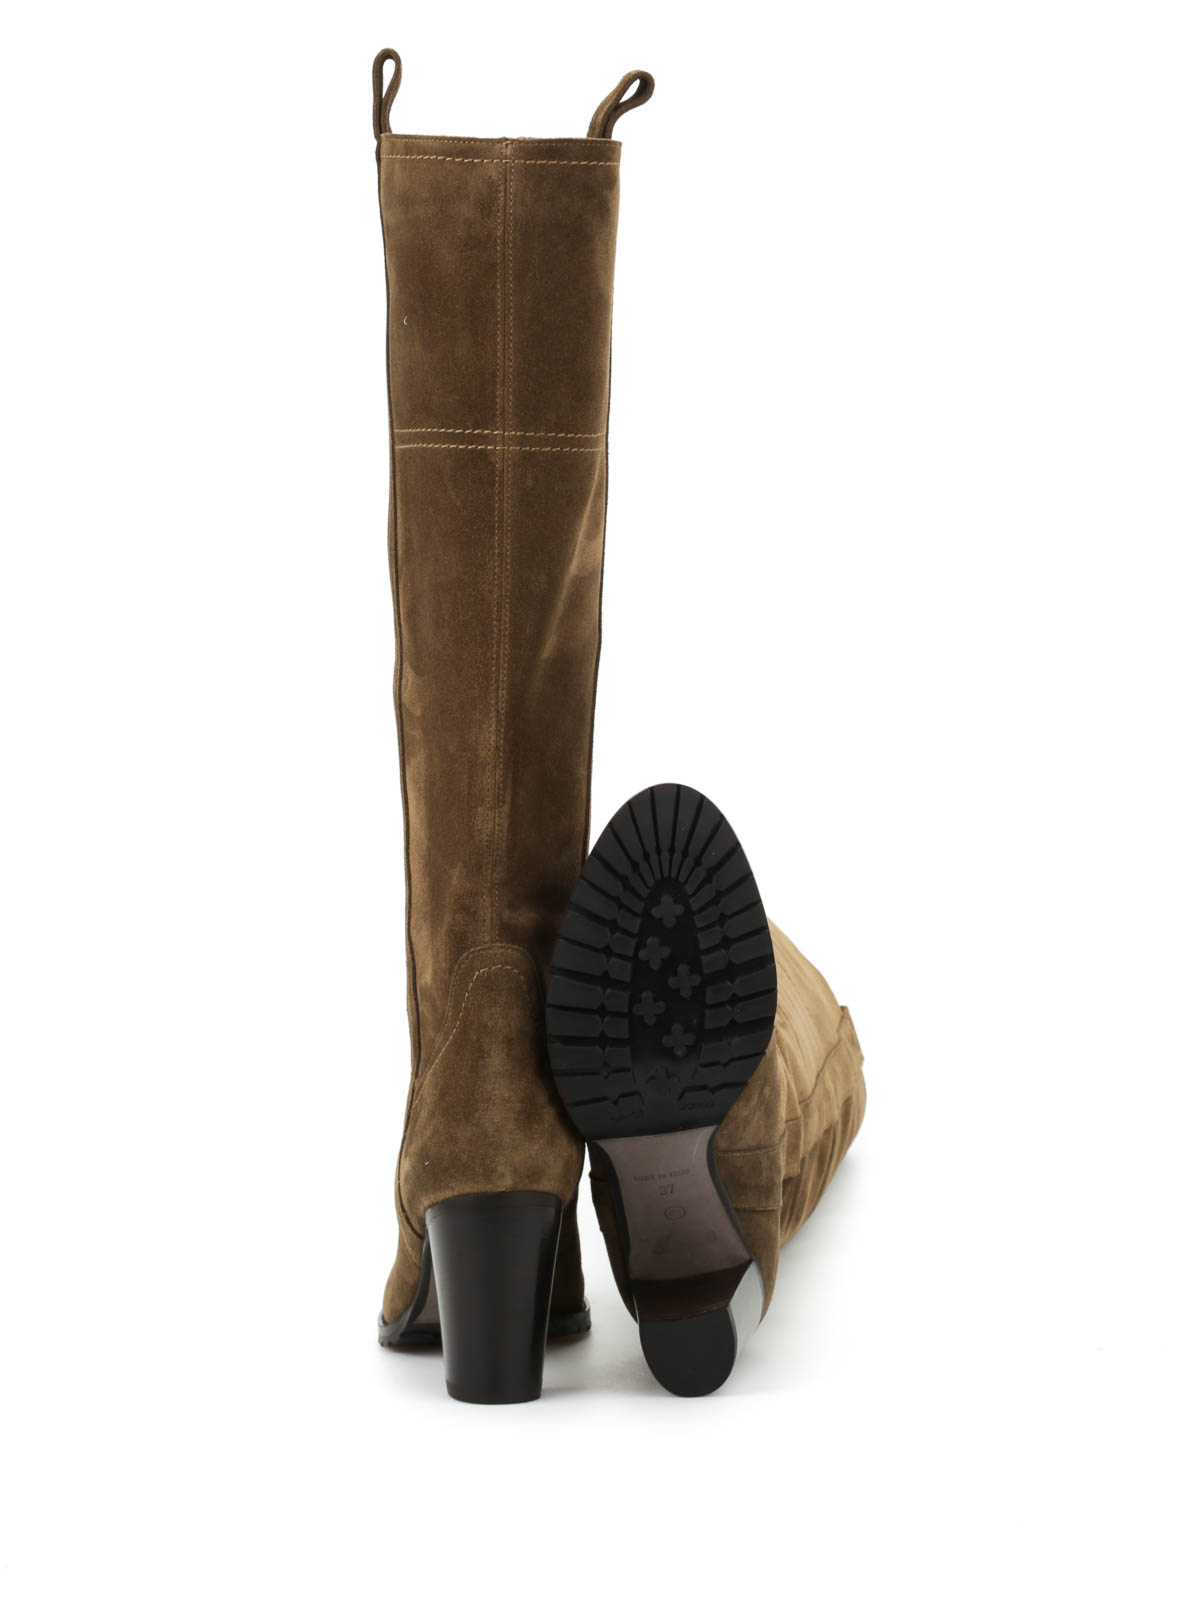 Suede boots by D\'Archive by L\'Autre Chose - boots | iKRIX